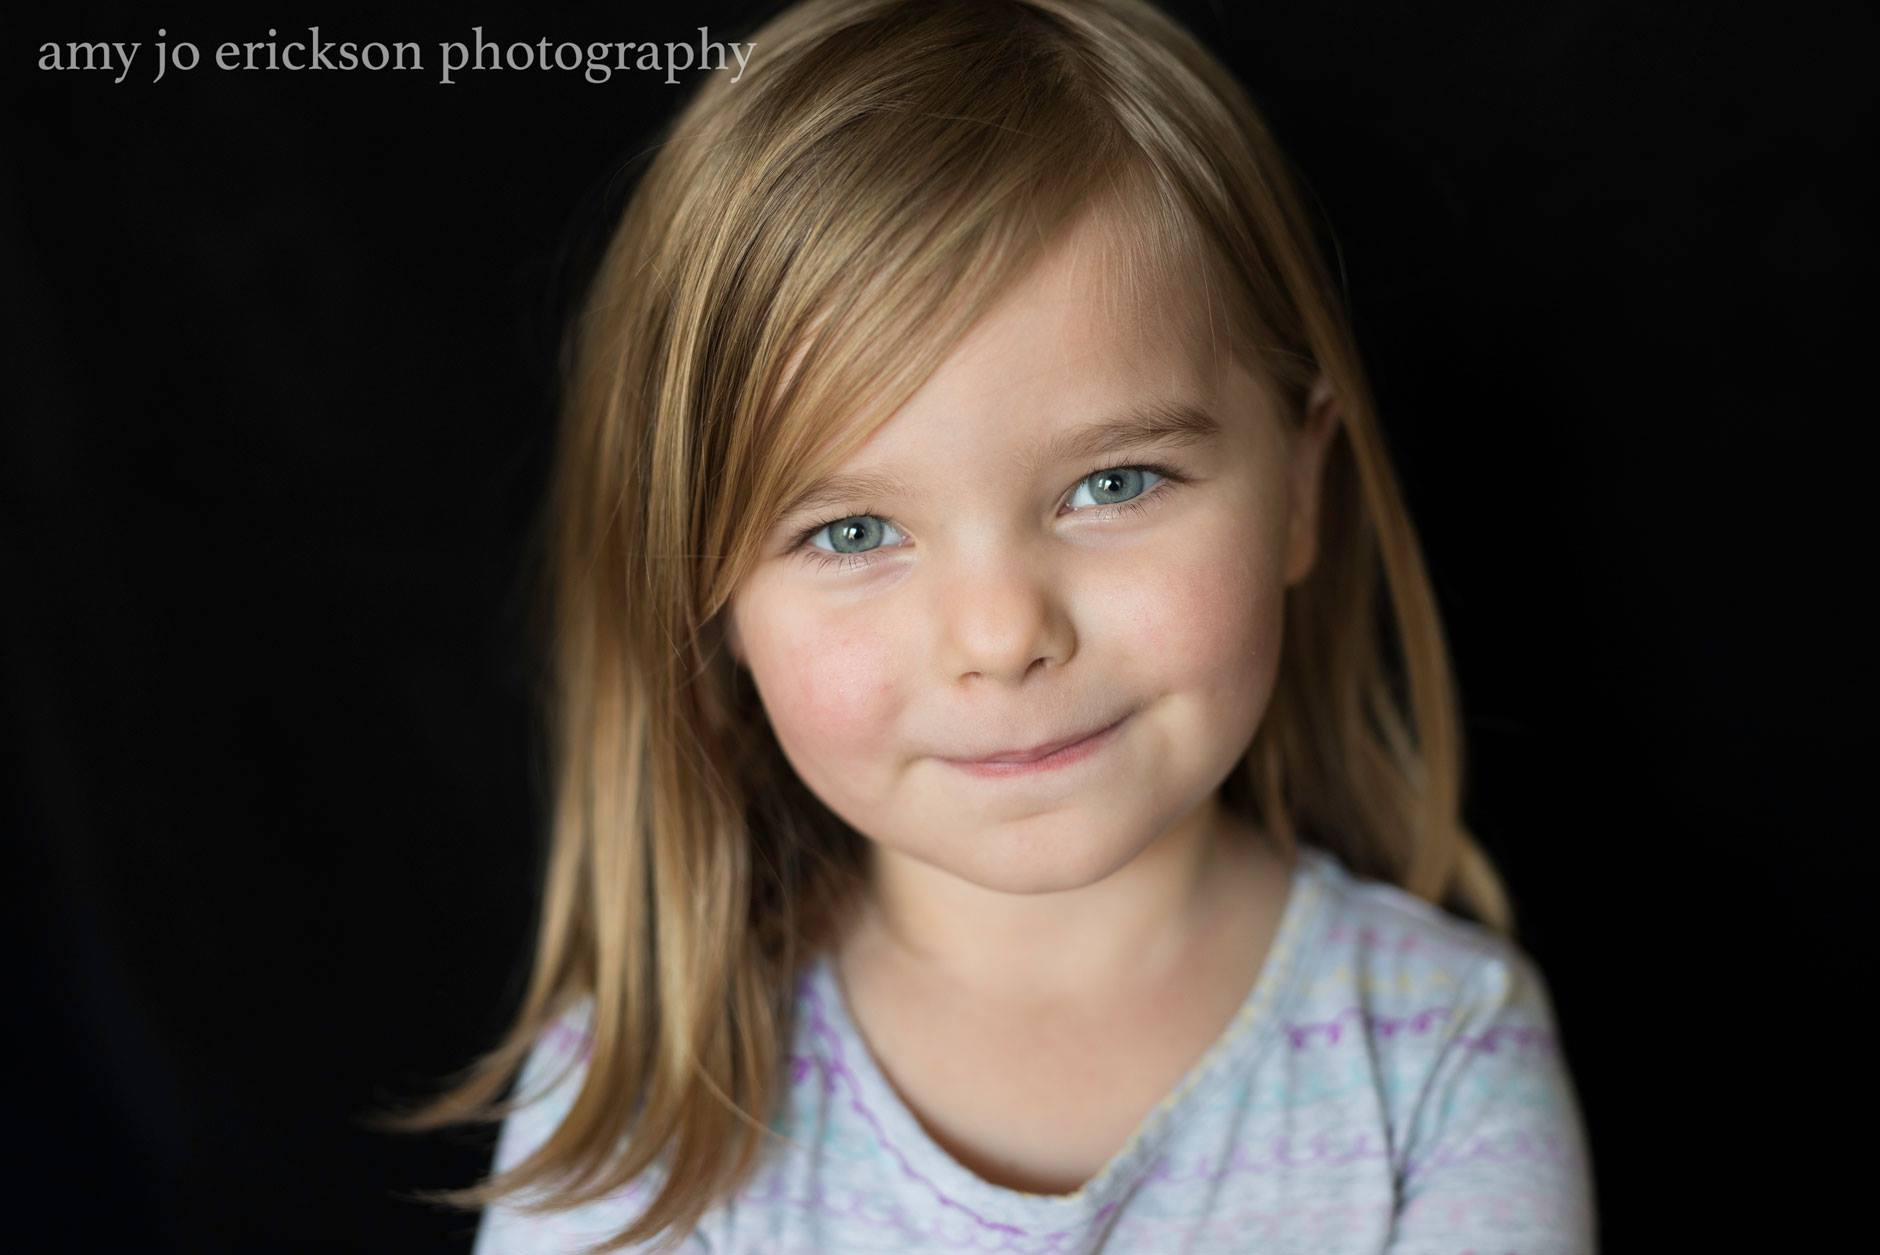 elena blair schooled online fine art child portrait photographer amy jo erickson